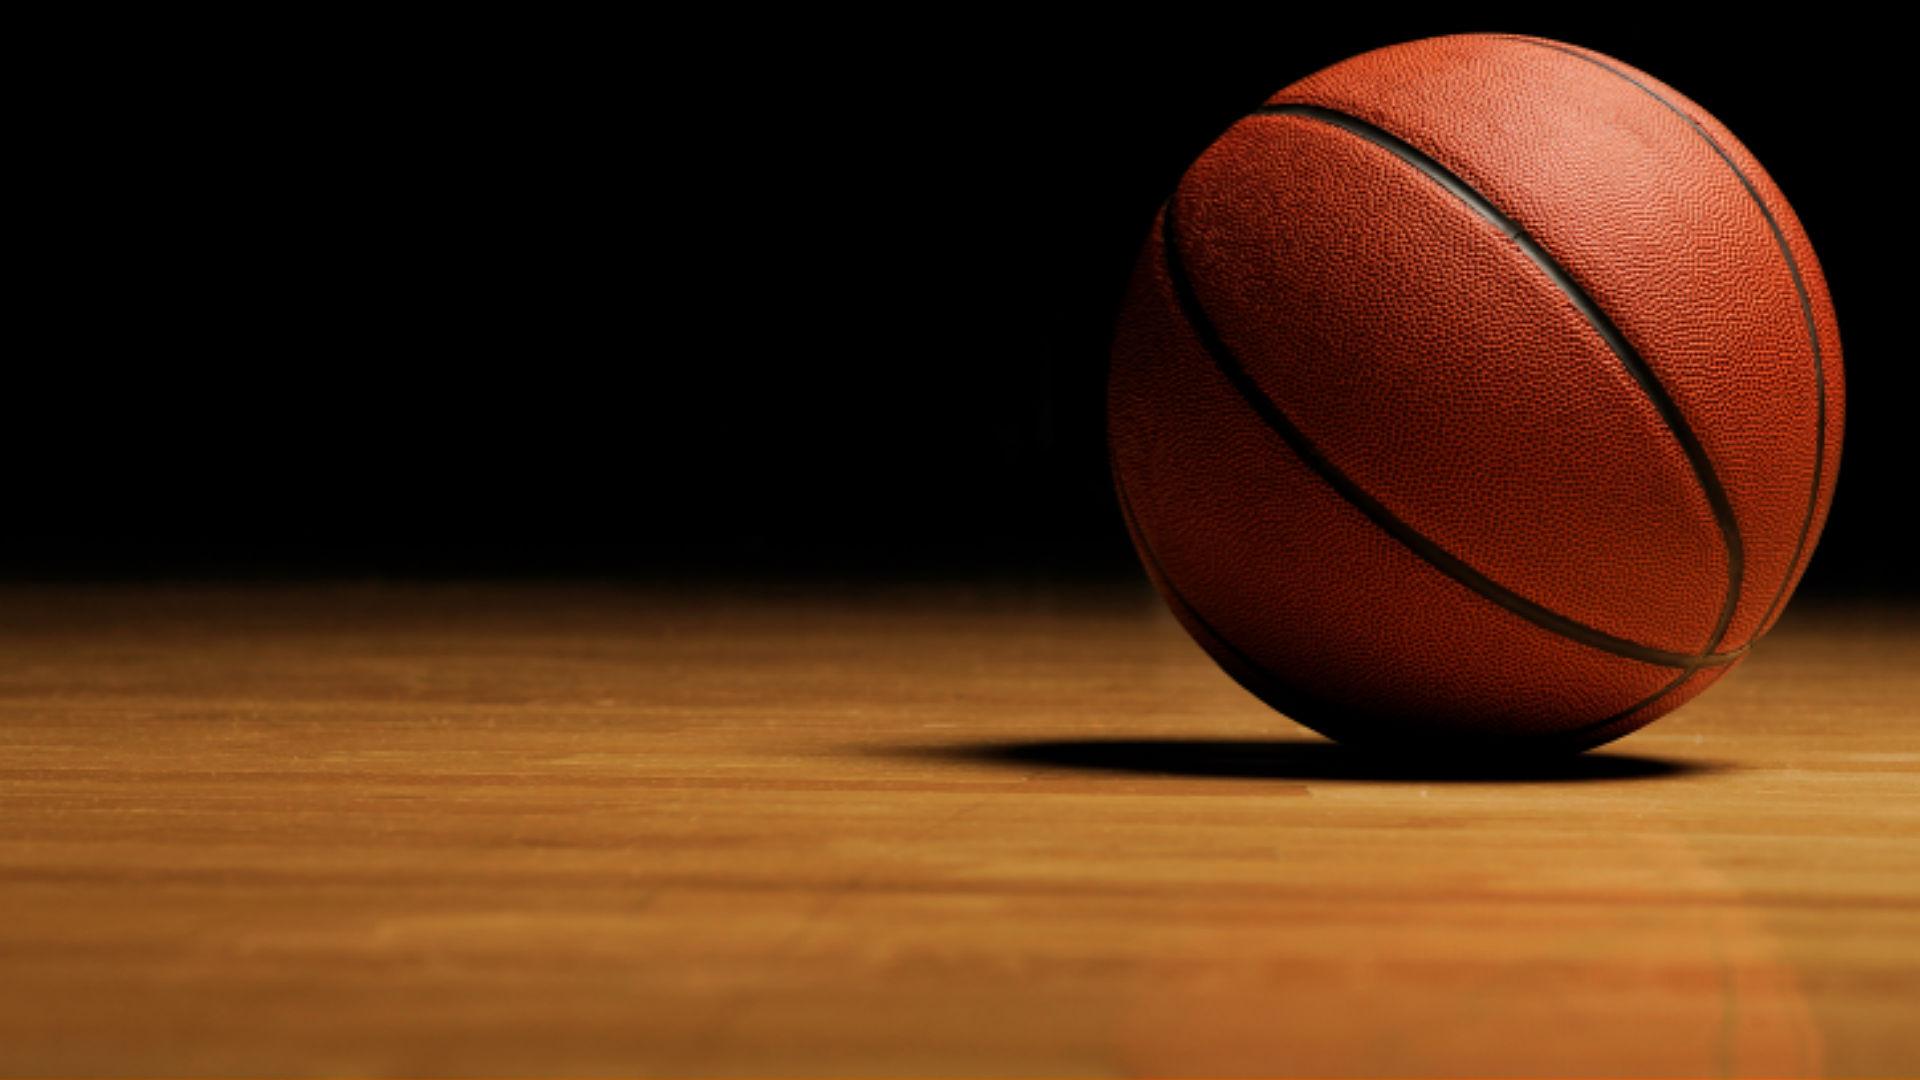 Basketball-jpg_1iu8p35rmiybv1n2kb79f5x3c0